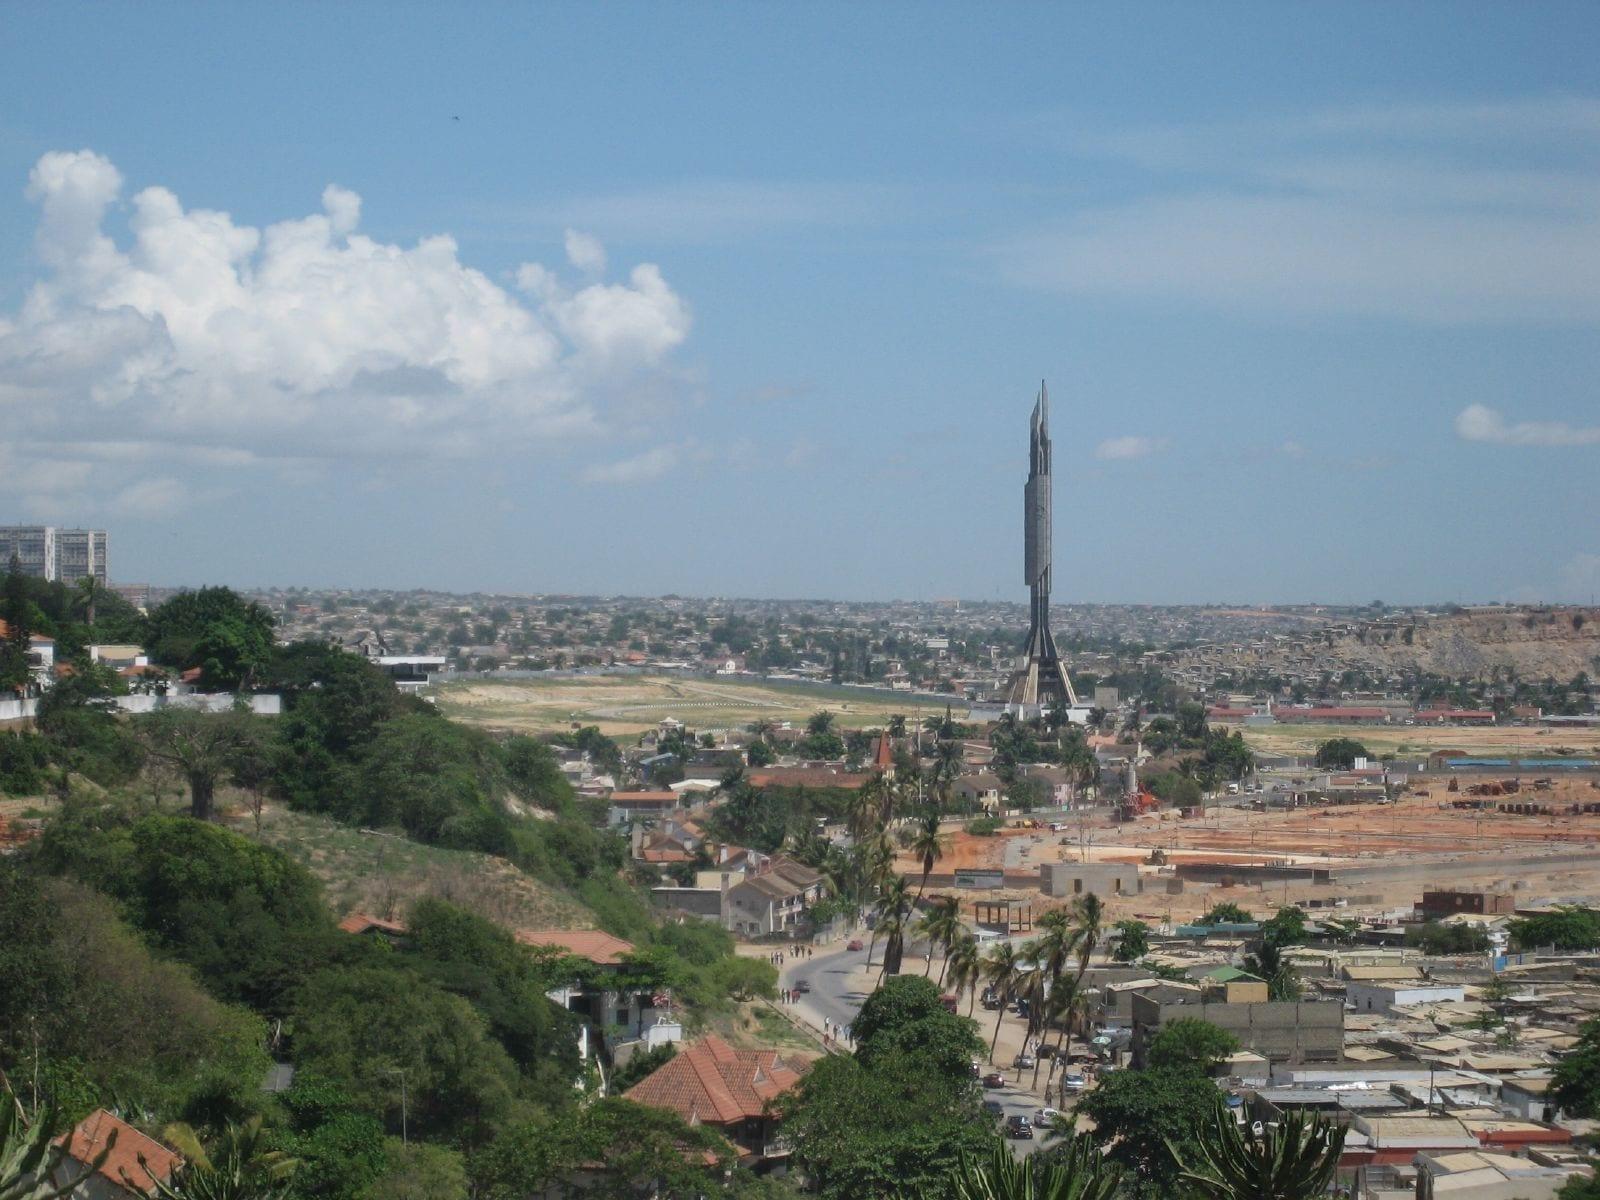 El mausoleo de Augustinho Neto Luanda Angola